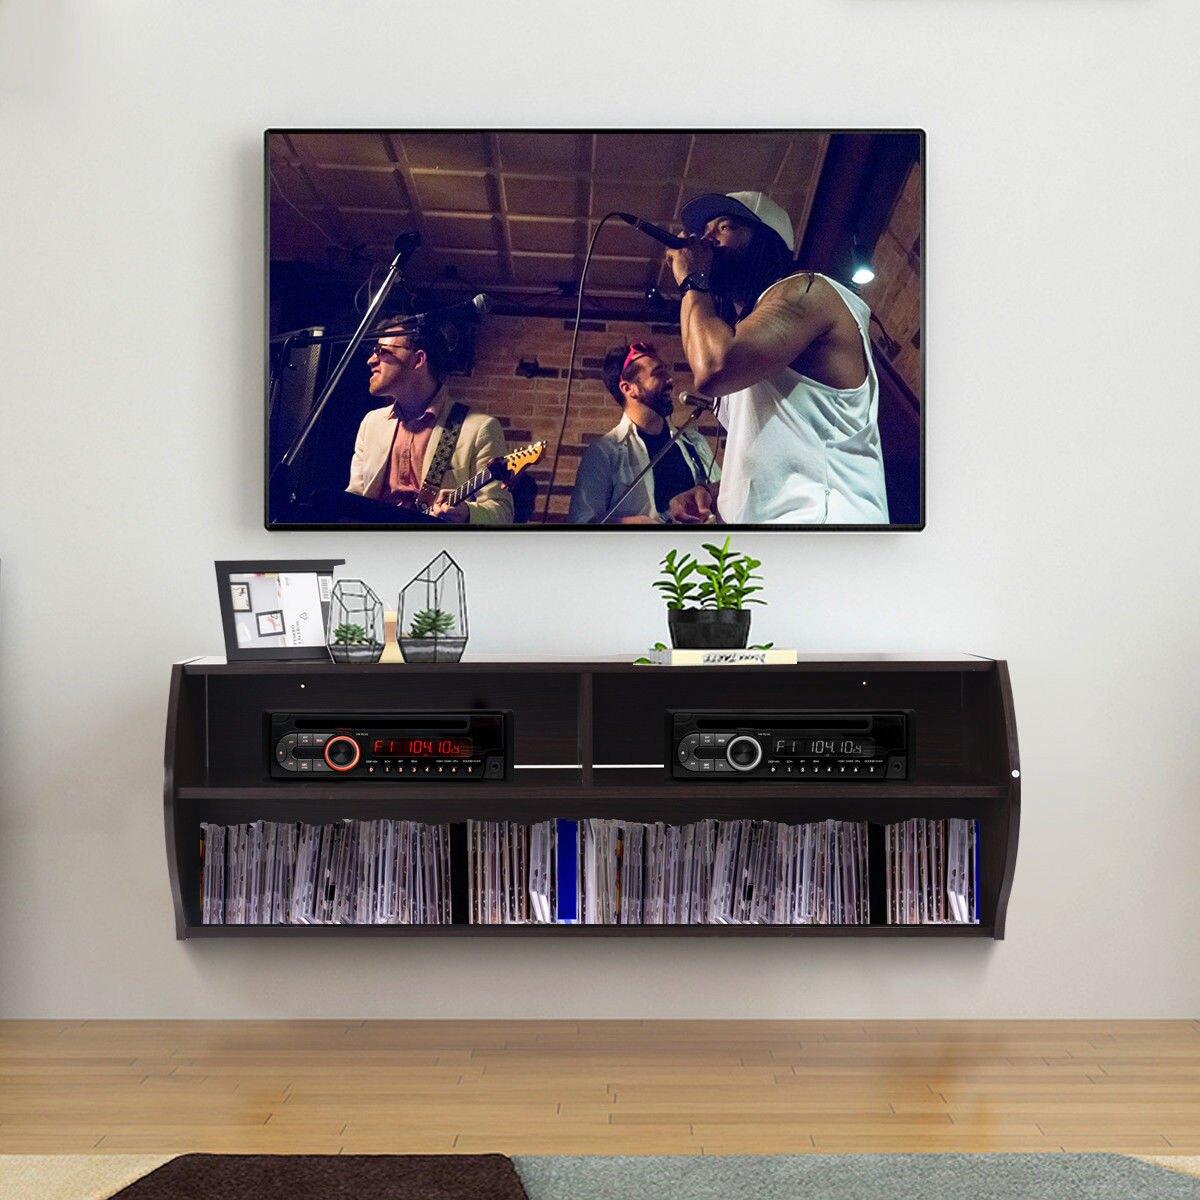 way tier modern floating shelf wall mounted for soundbar hanging audio video supports desk bookshelf combo white melamine shelves coat racks mantel plans media stand ikea narrow